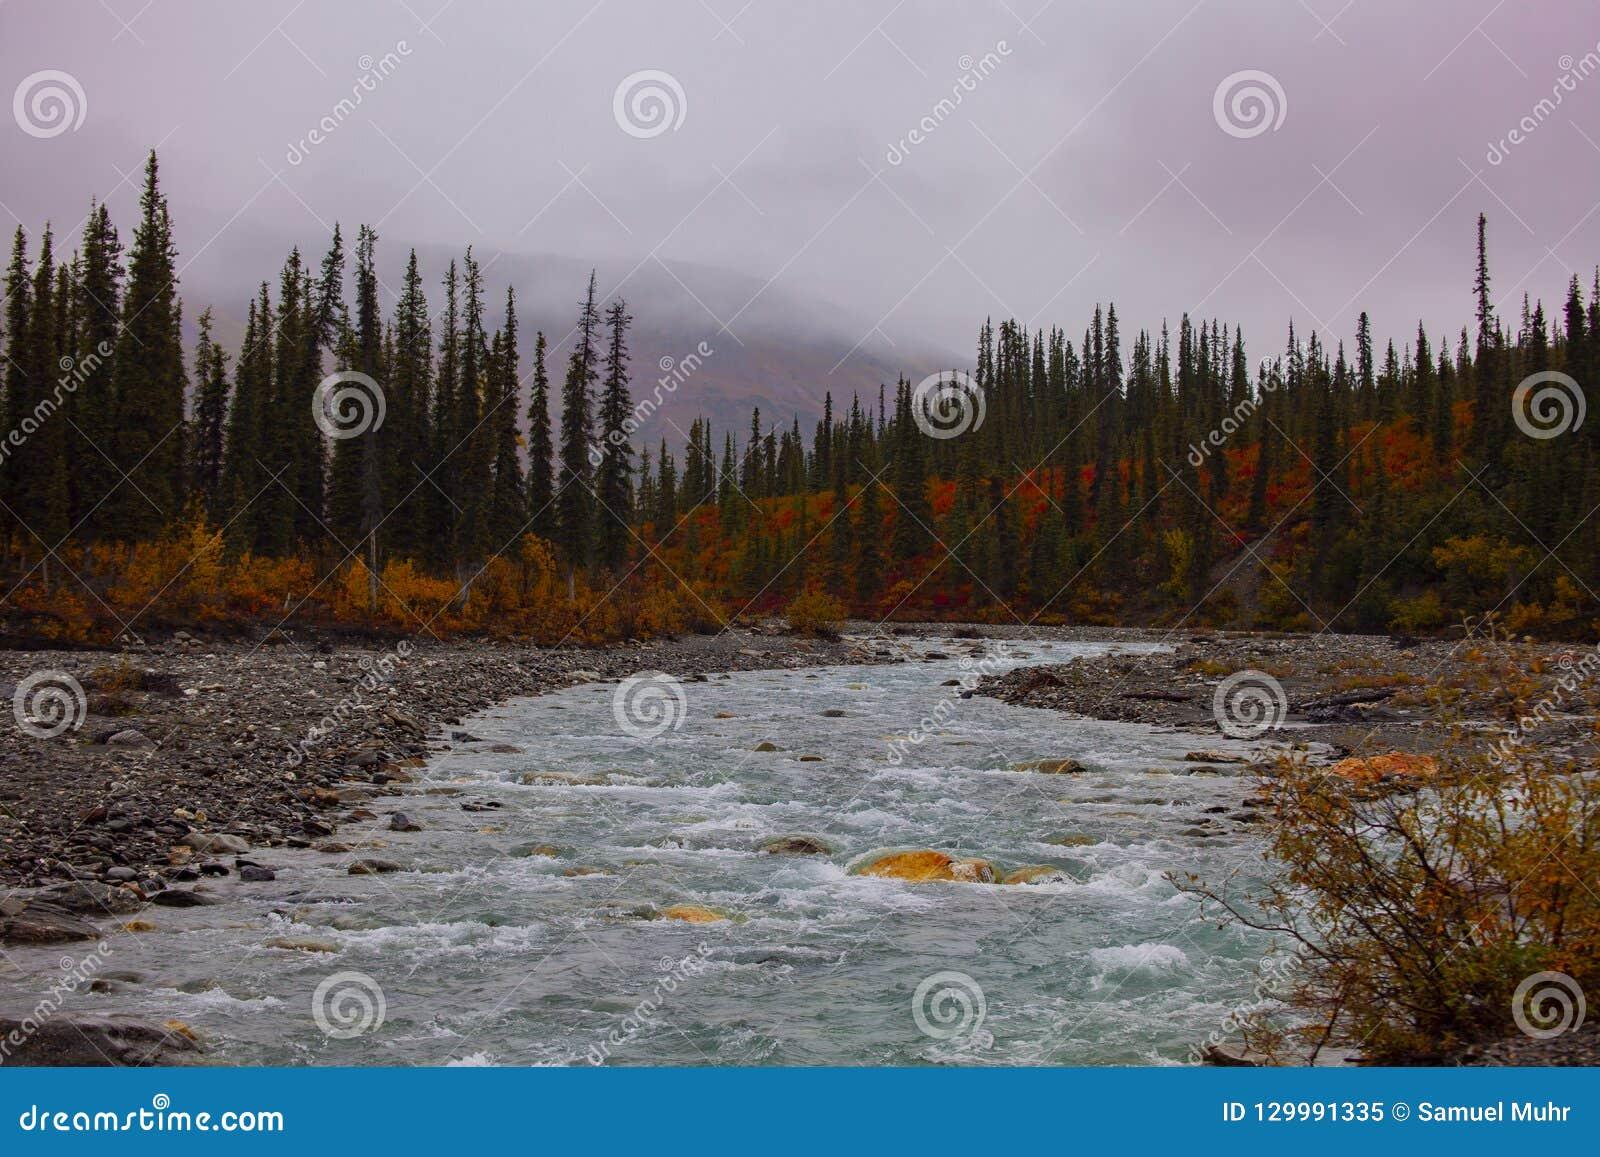 Schöner Nebenfluss in Alaska